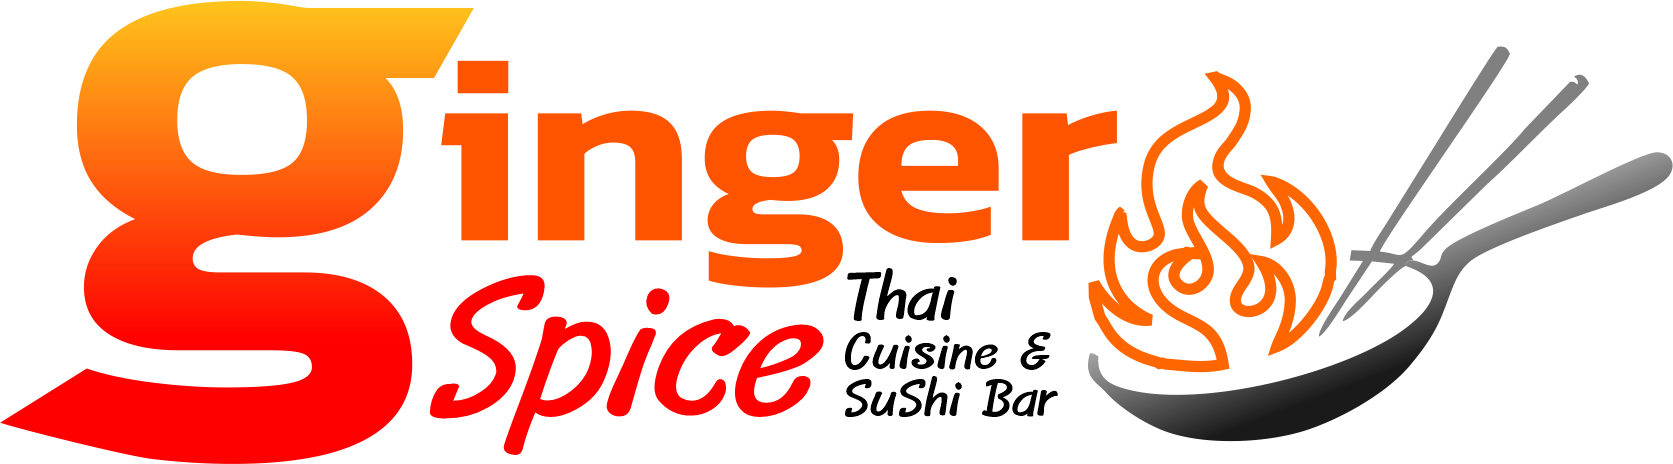 ginger909.com